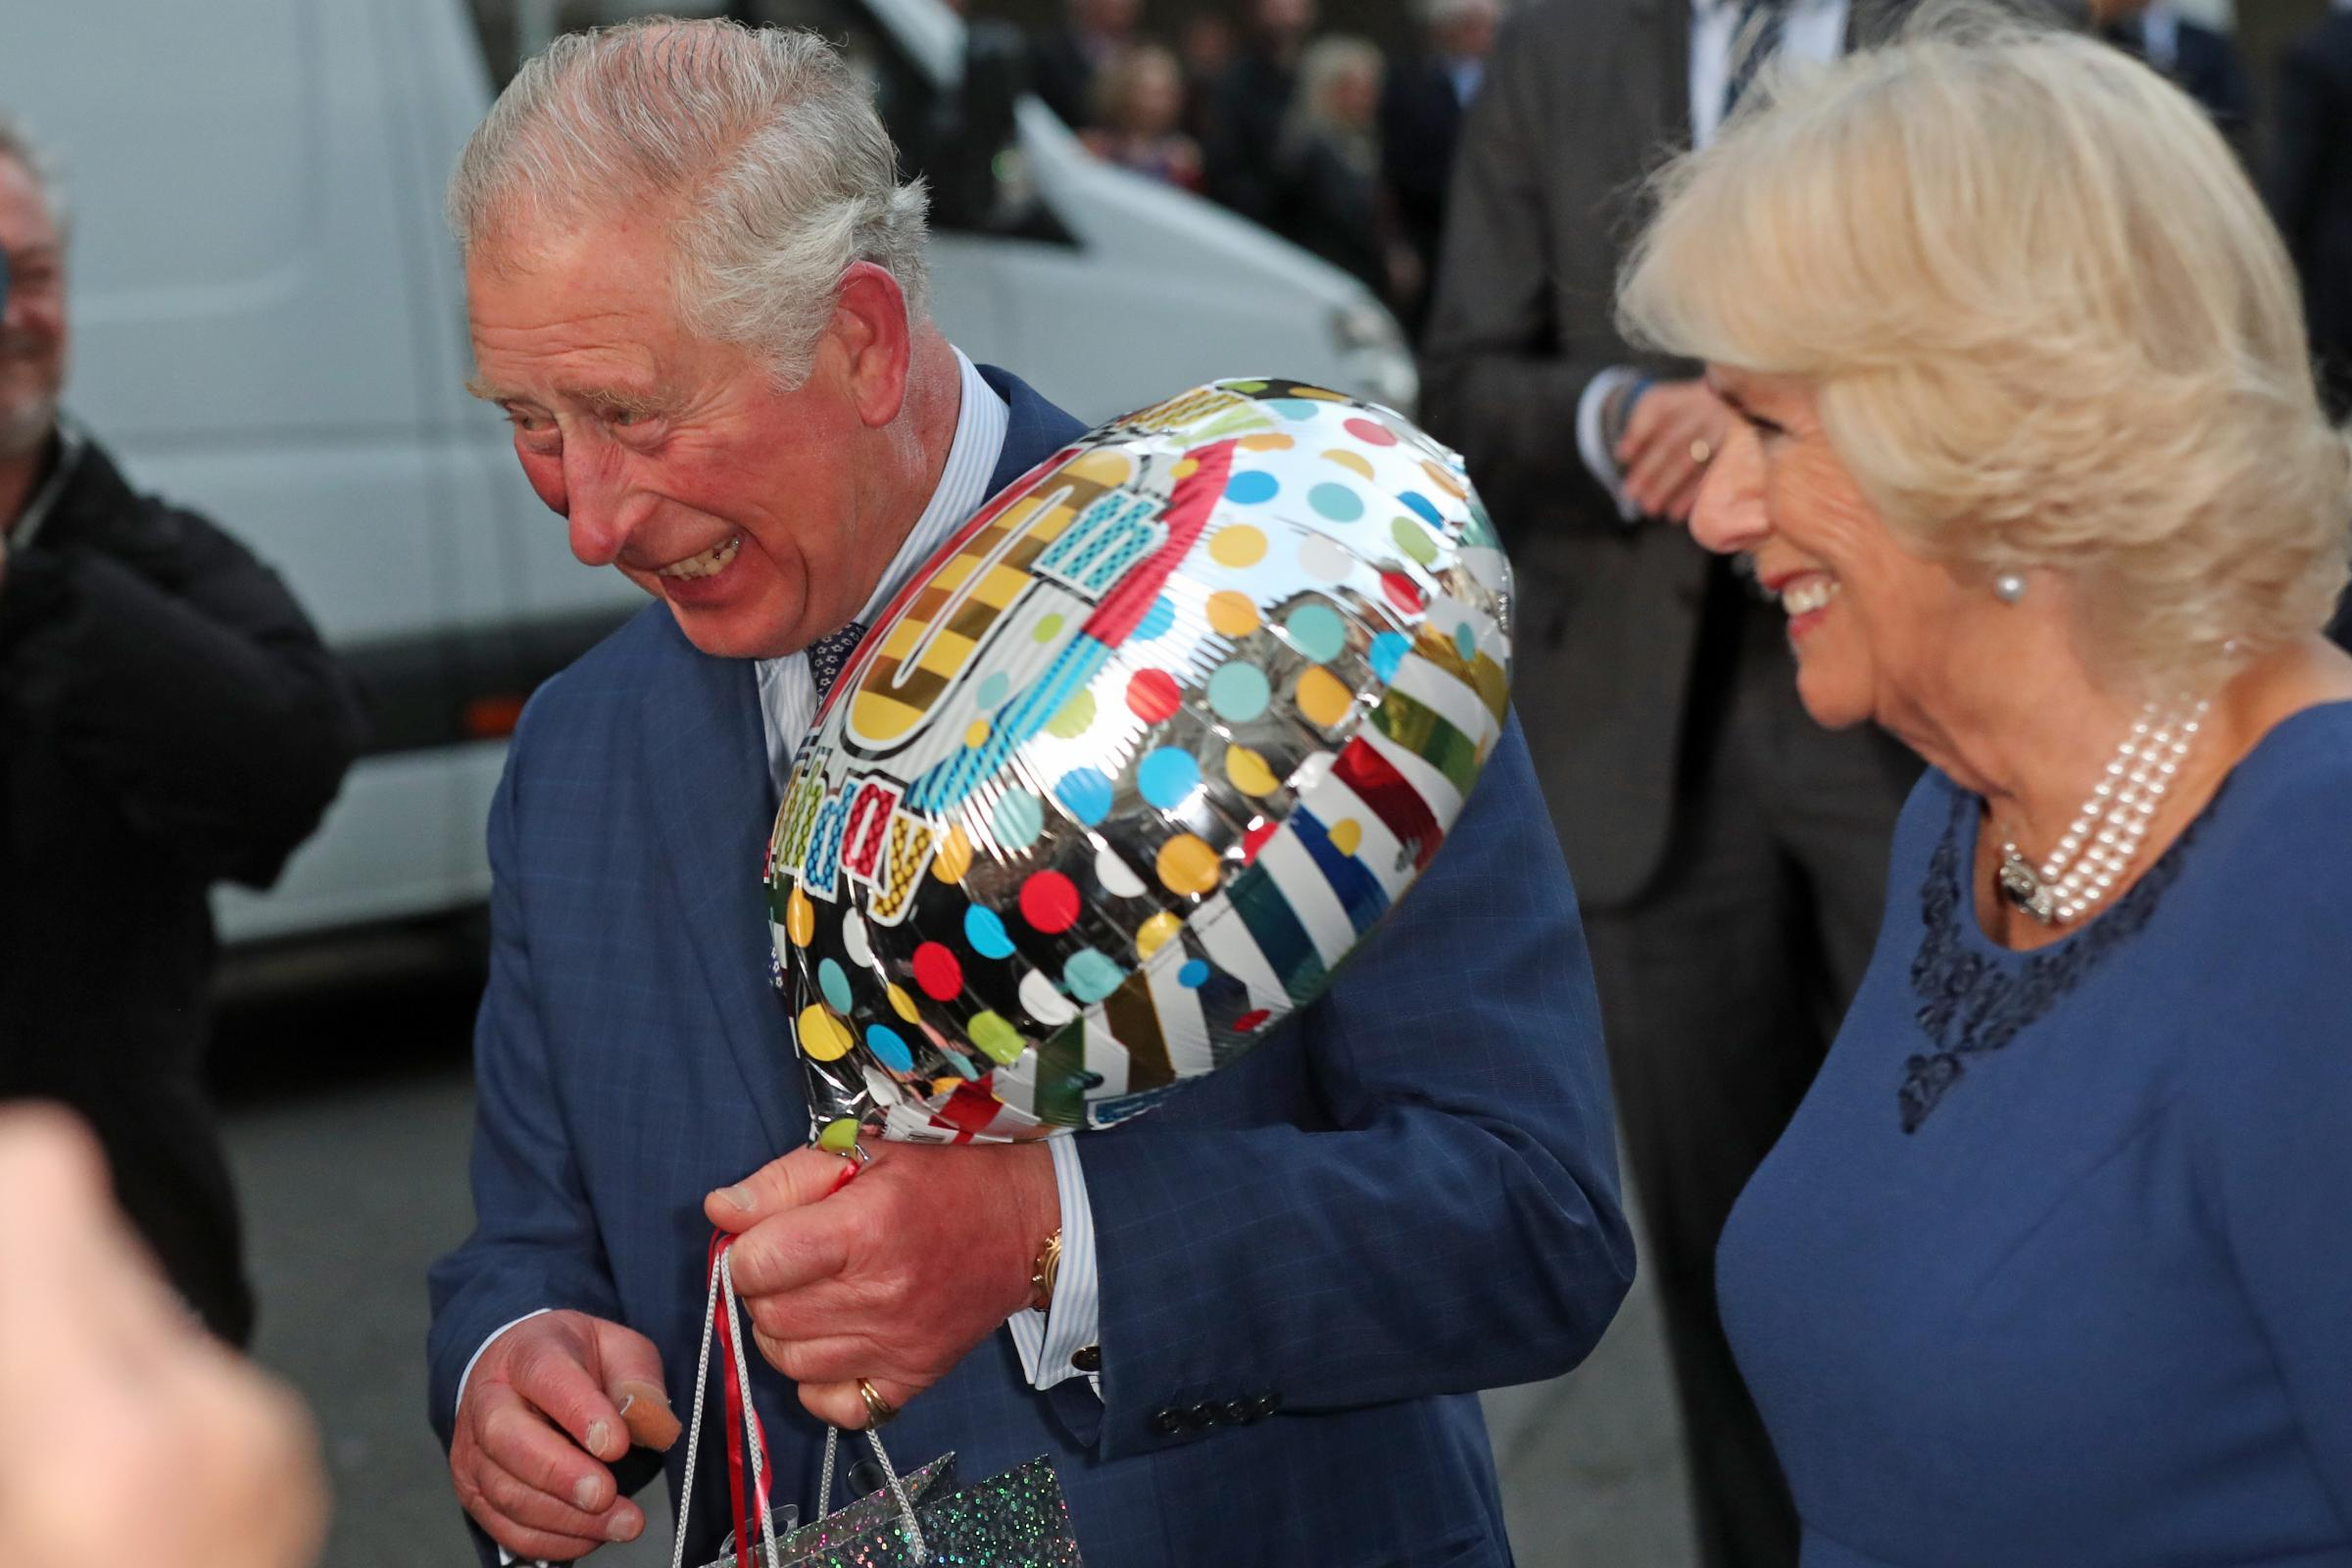 Prince Charles celebrates 70th birthday with 70 septuagenarians